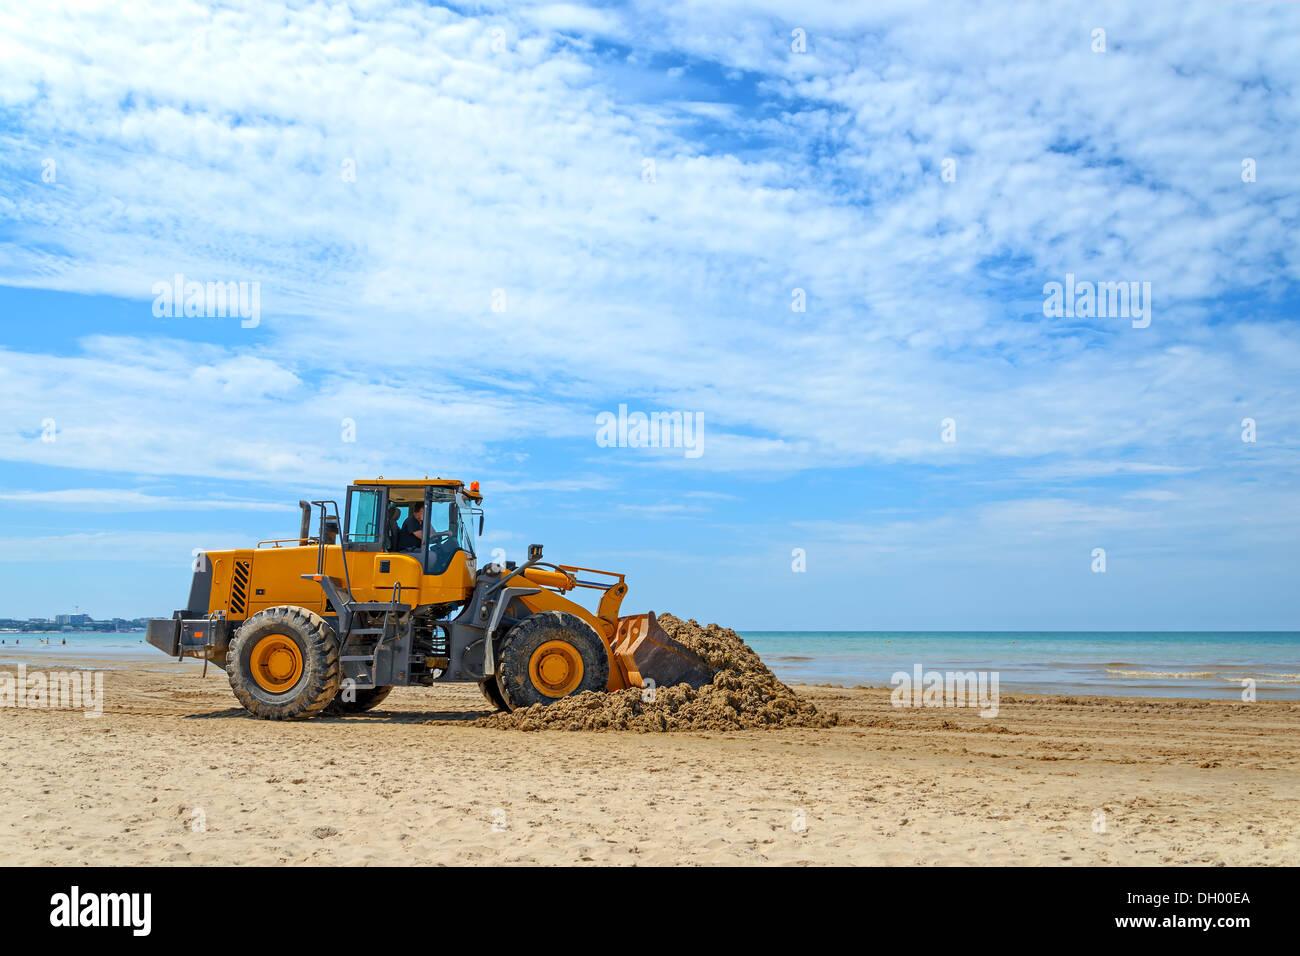 Bulldozer - Stock Image